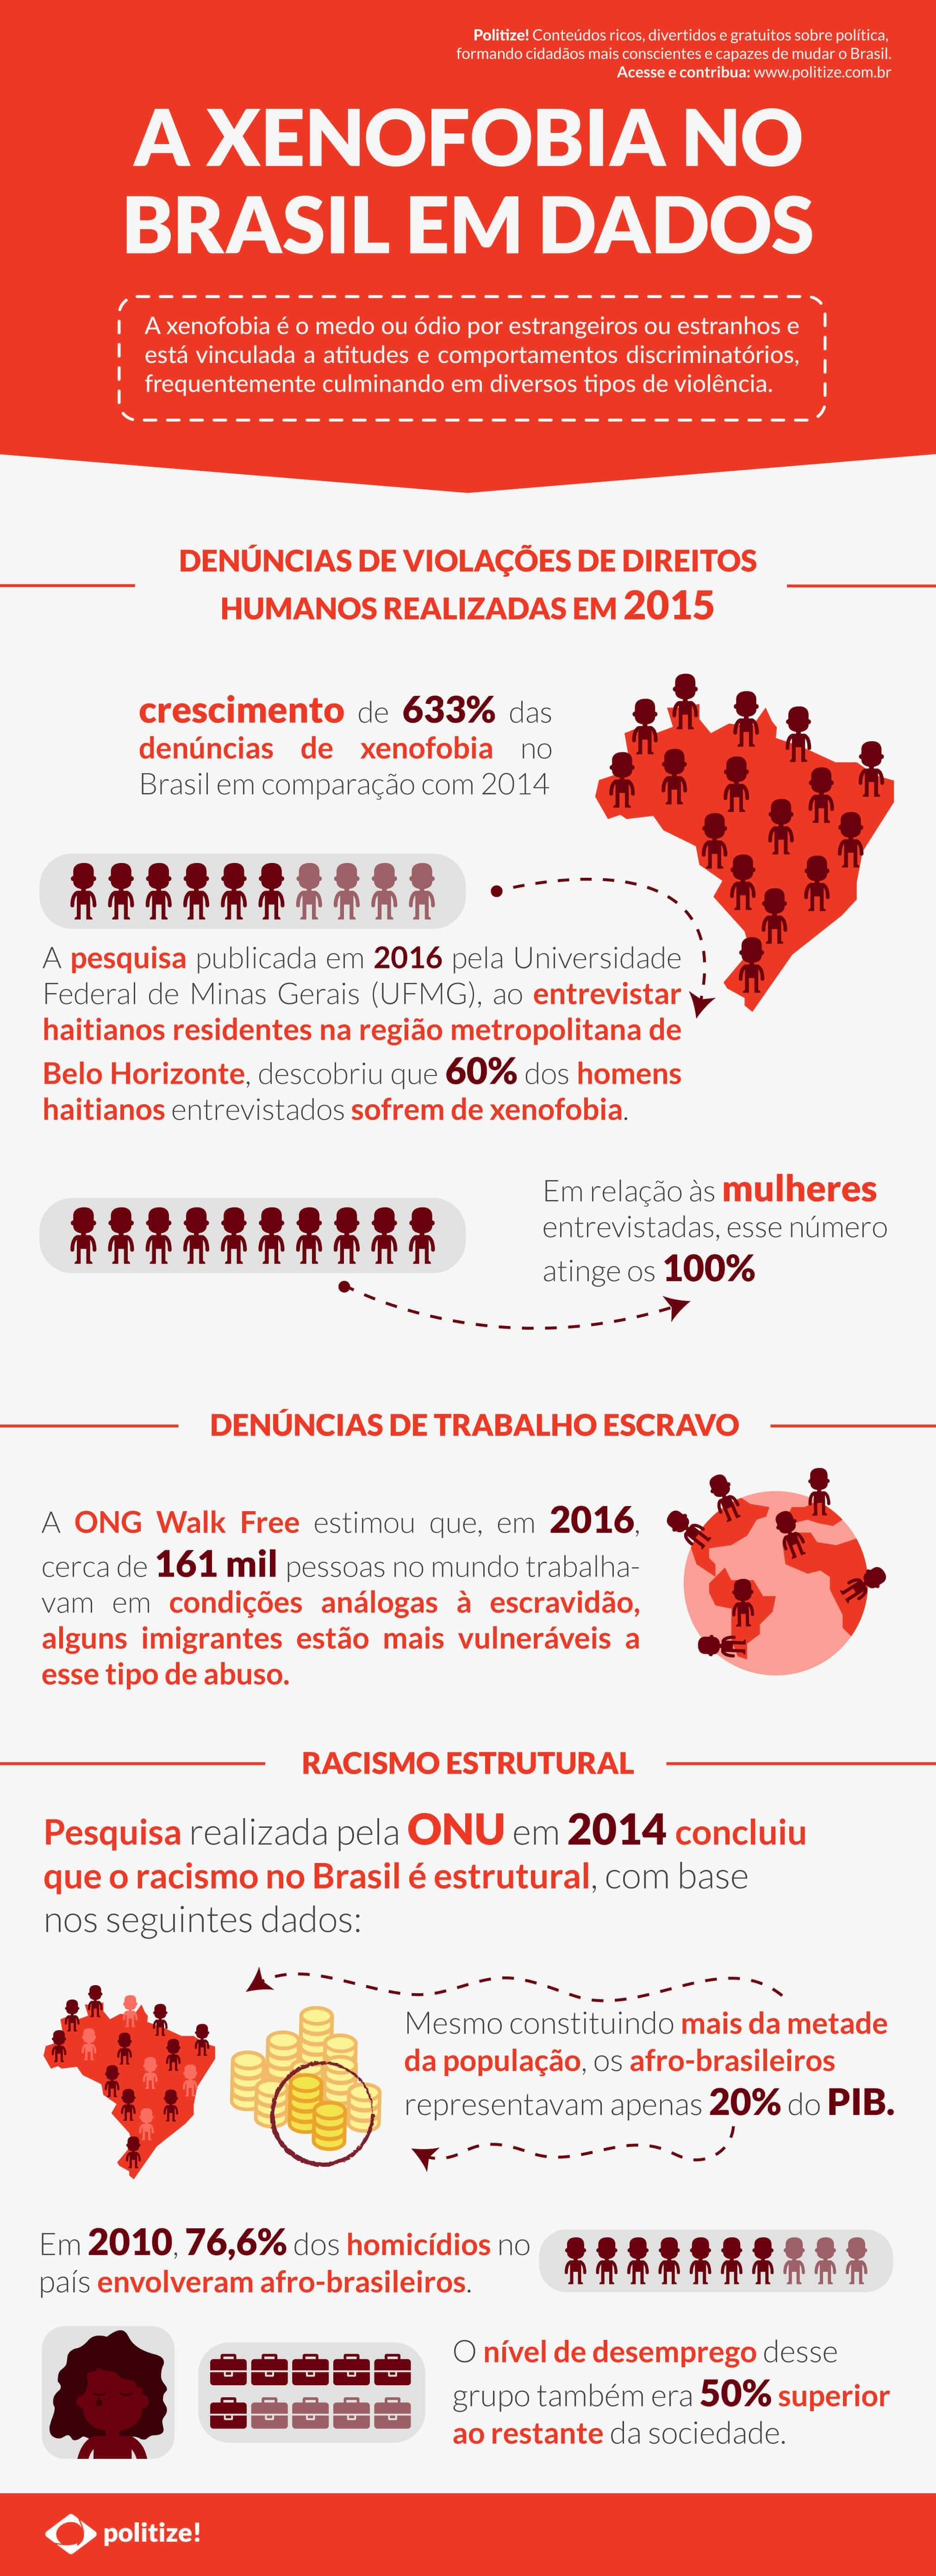 Xenofobia no Brasil: o que gera essa intolerância? - Politize!